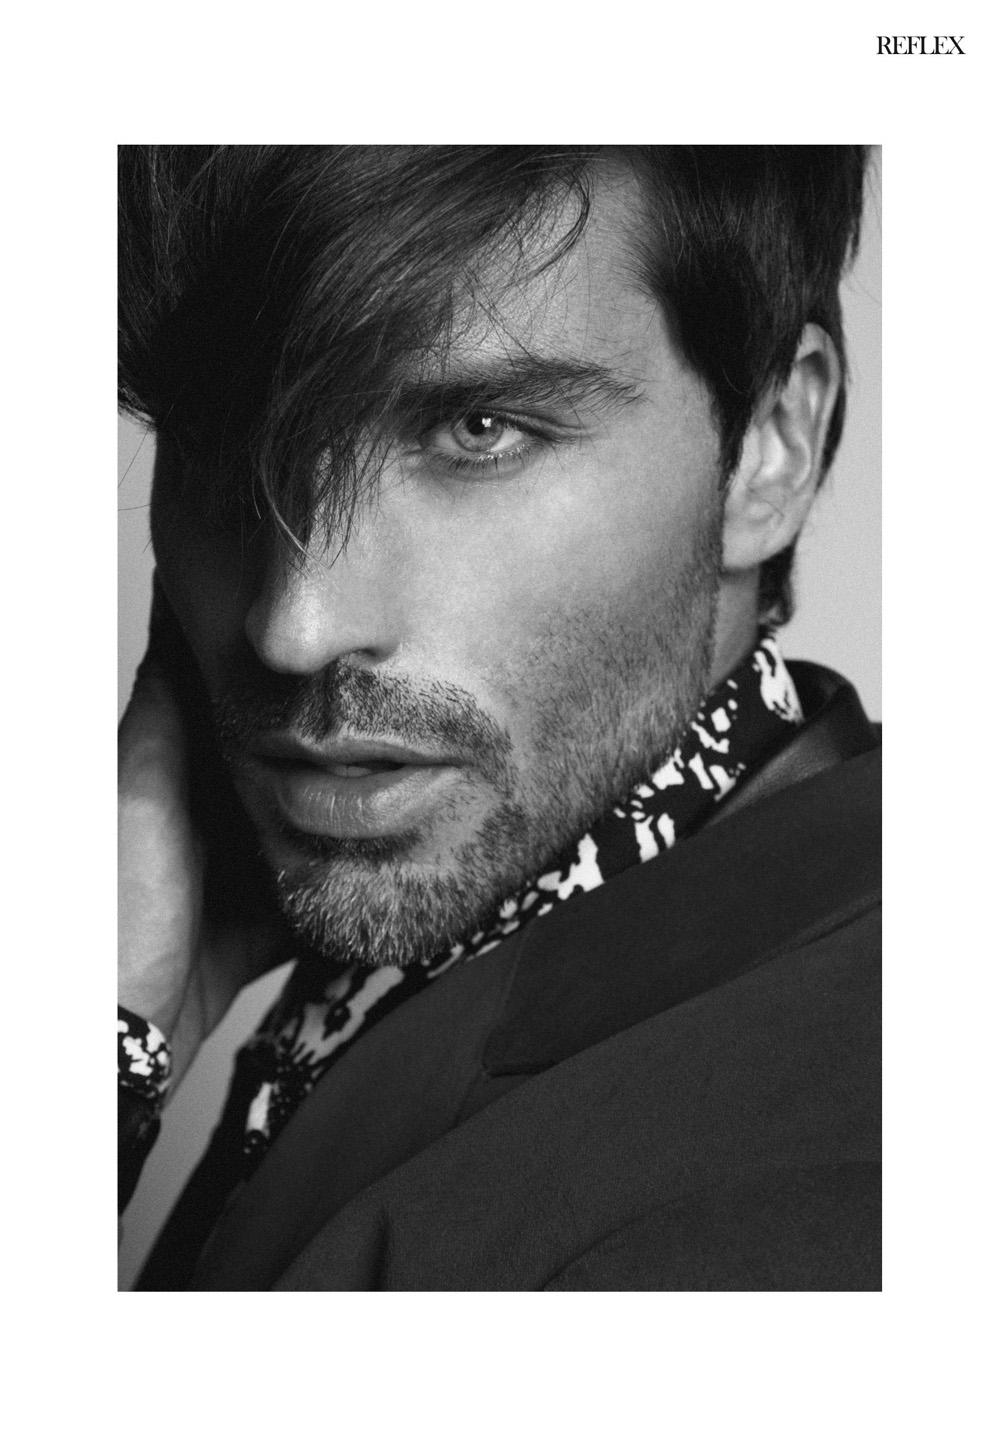 Assez FABRICIO ZUNINO for REFLEX HOMME – Fashionably Male JG56